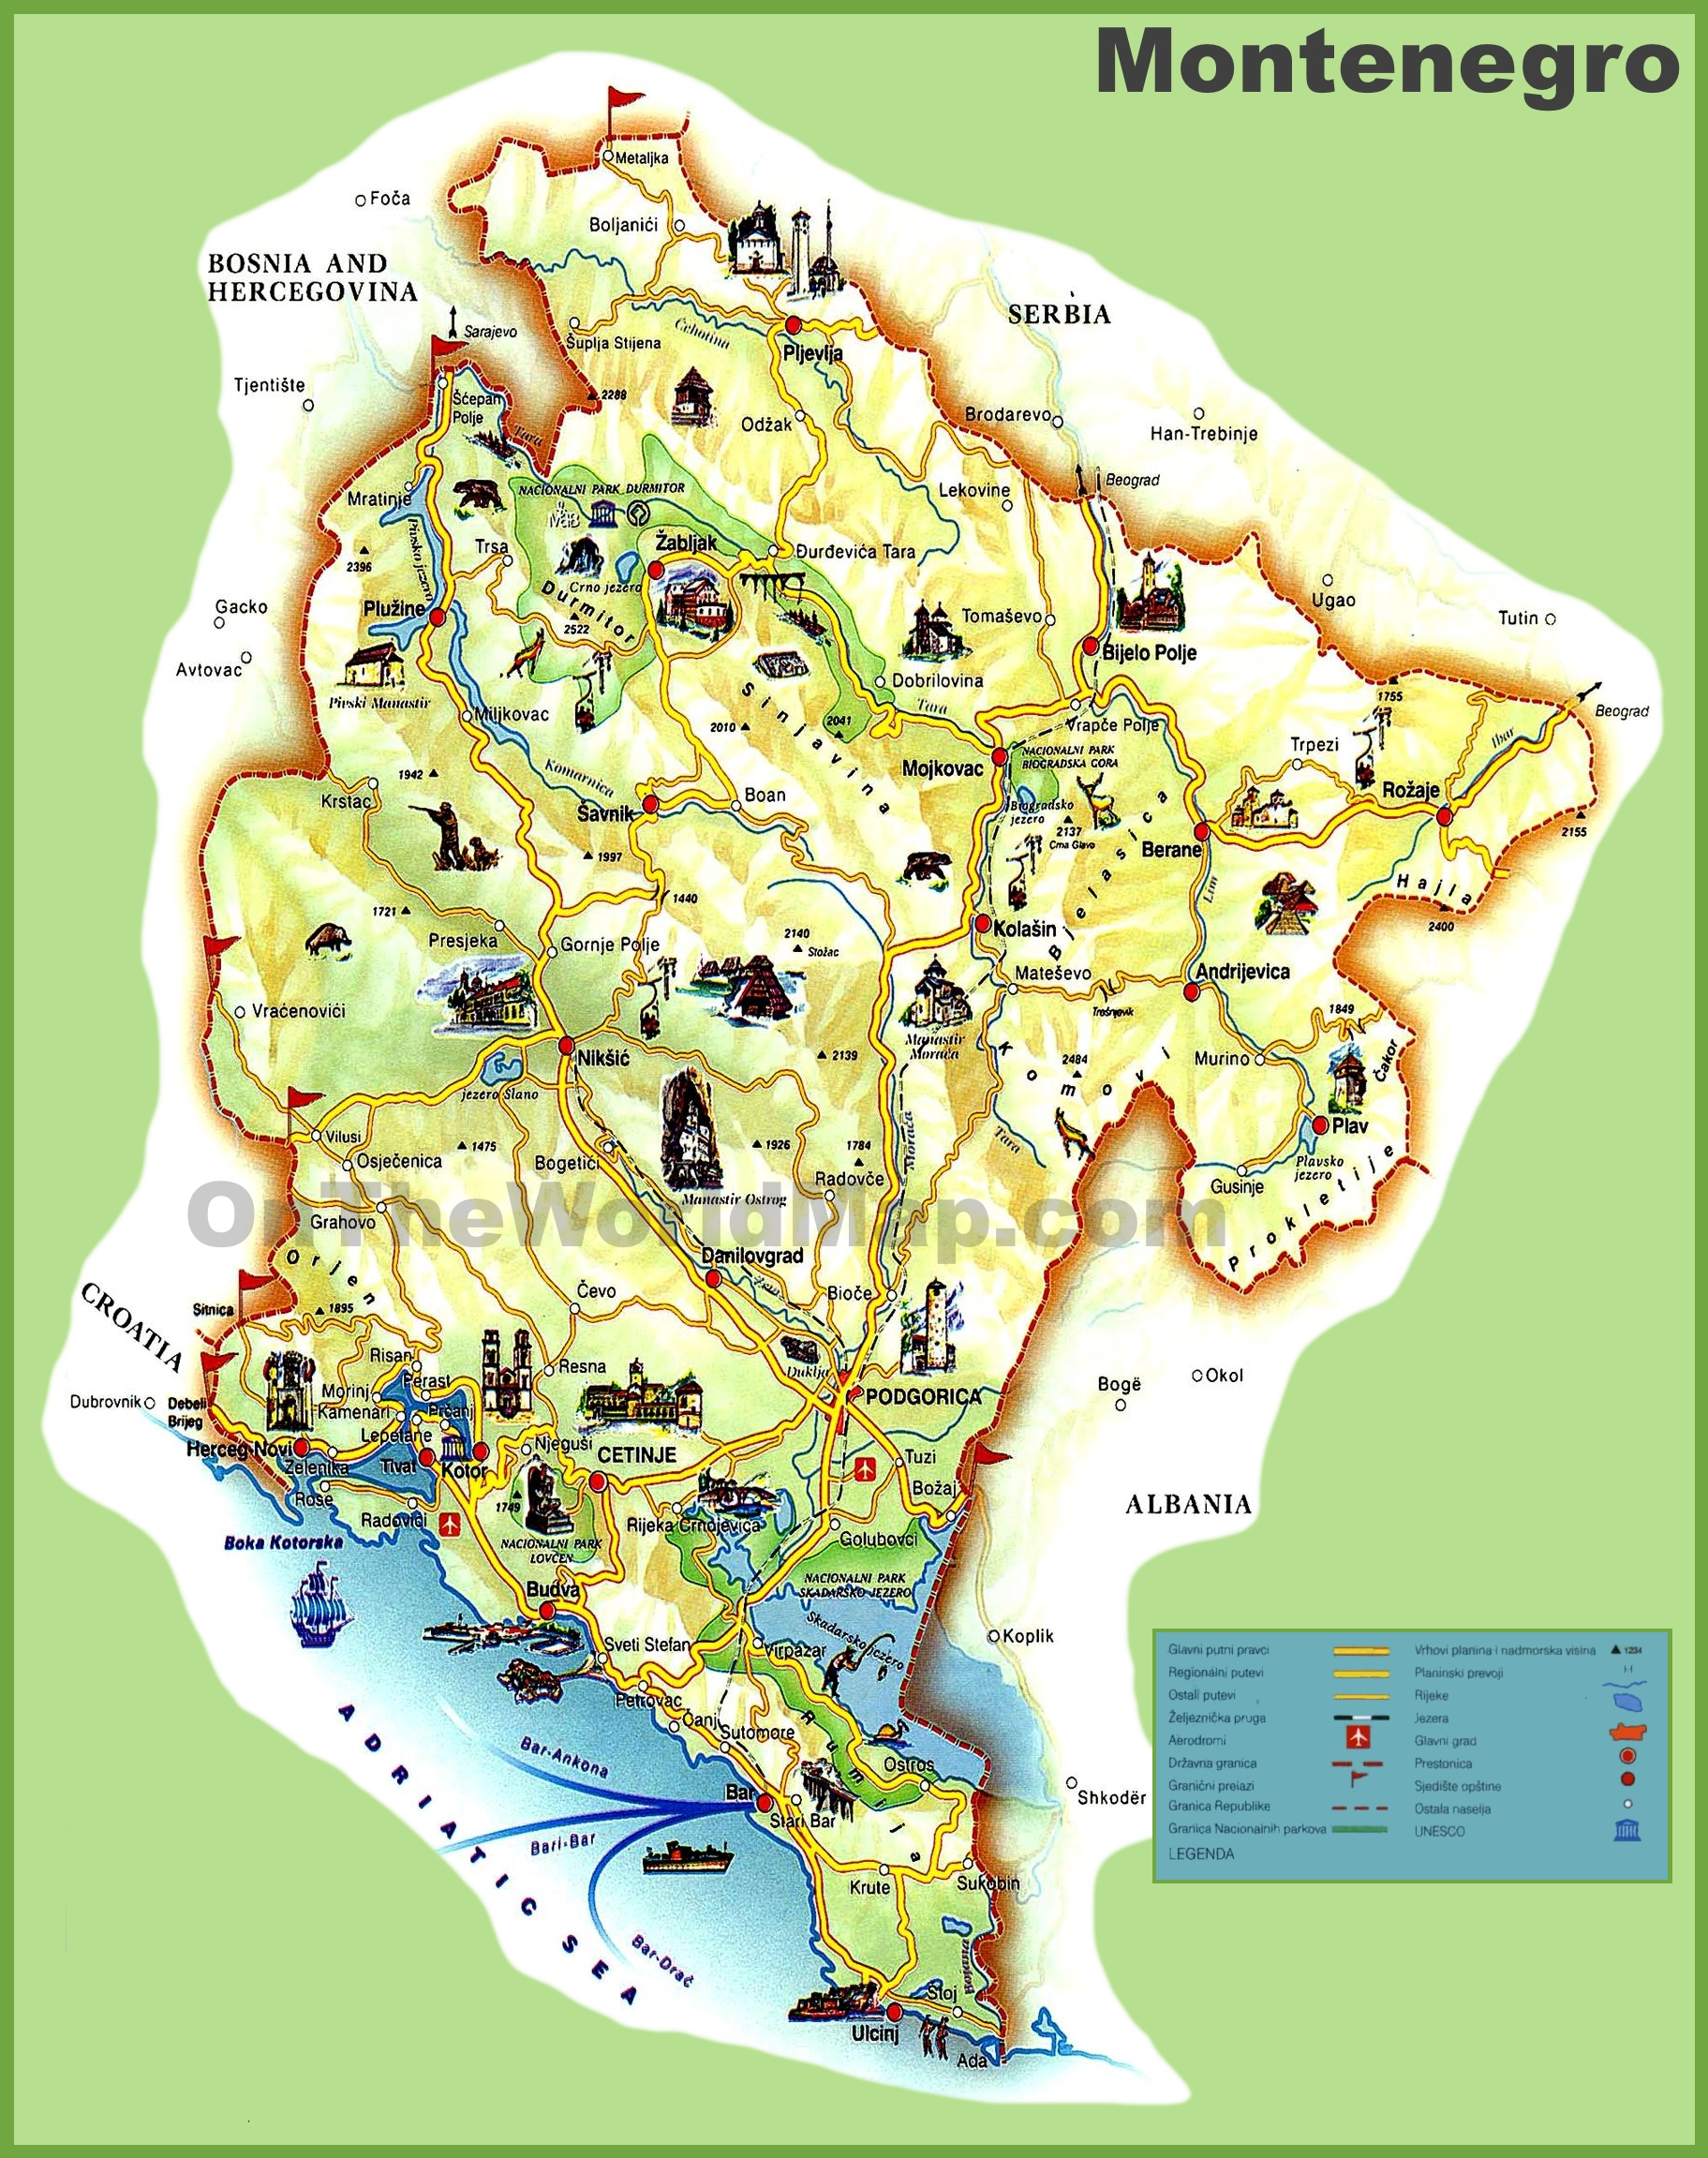 Montenegro Maps Maps of Montenegro